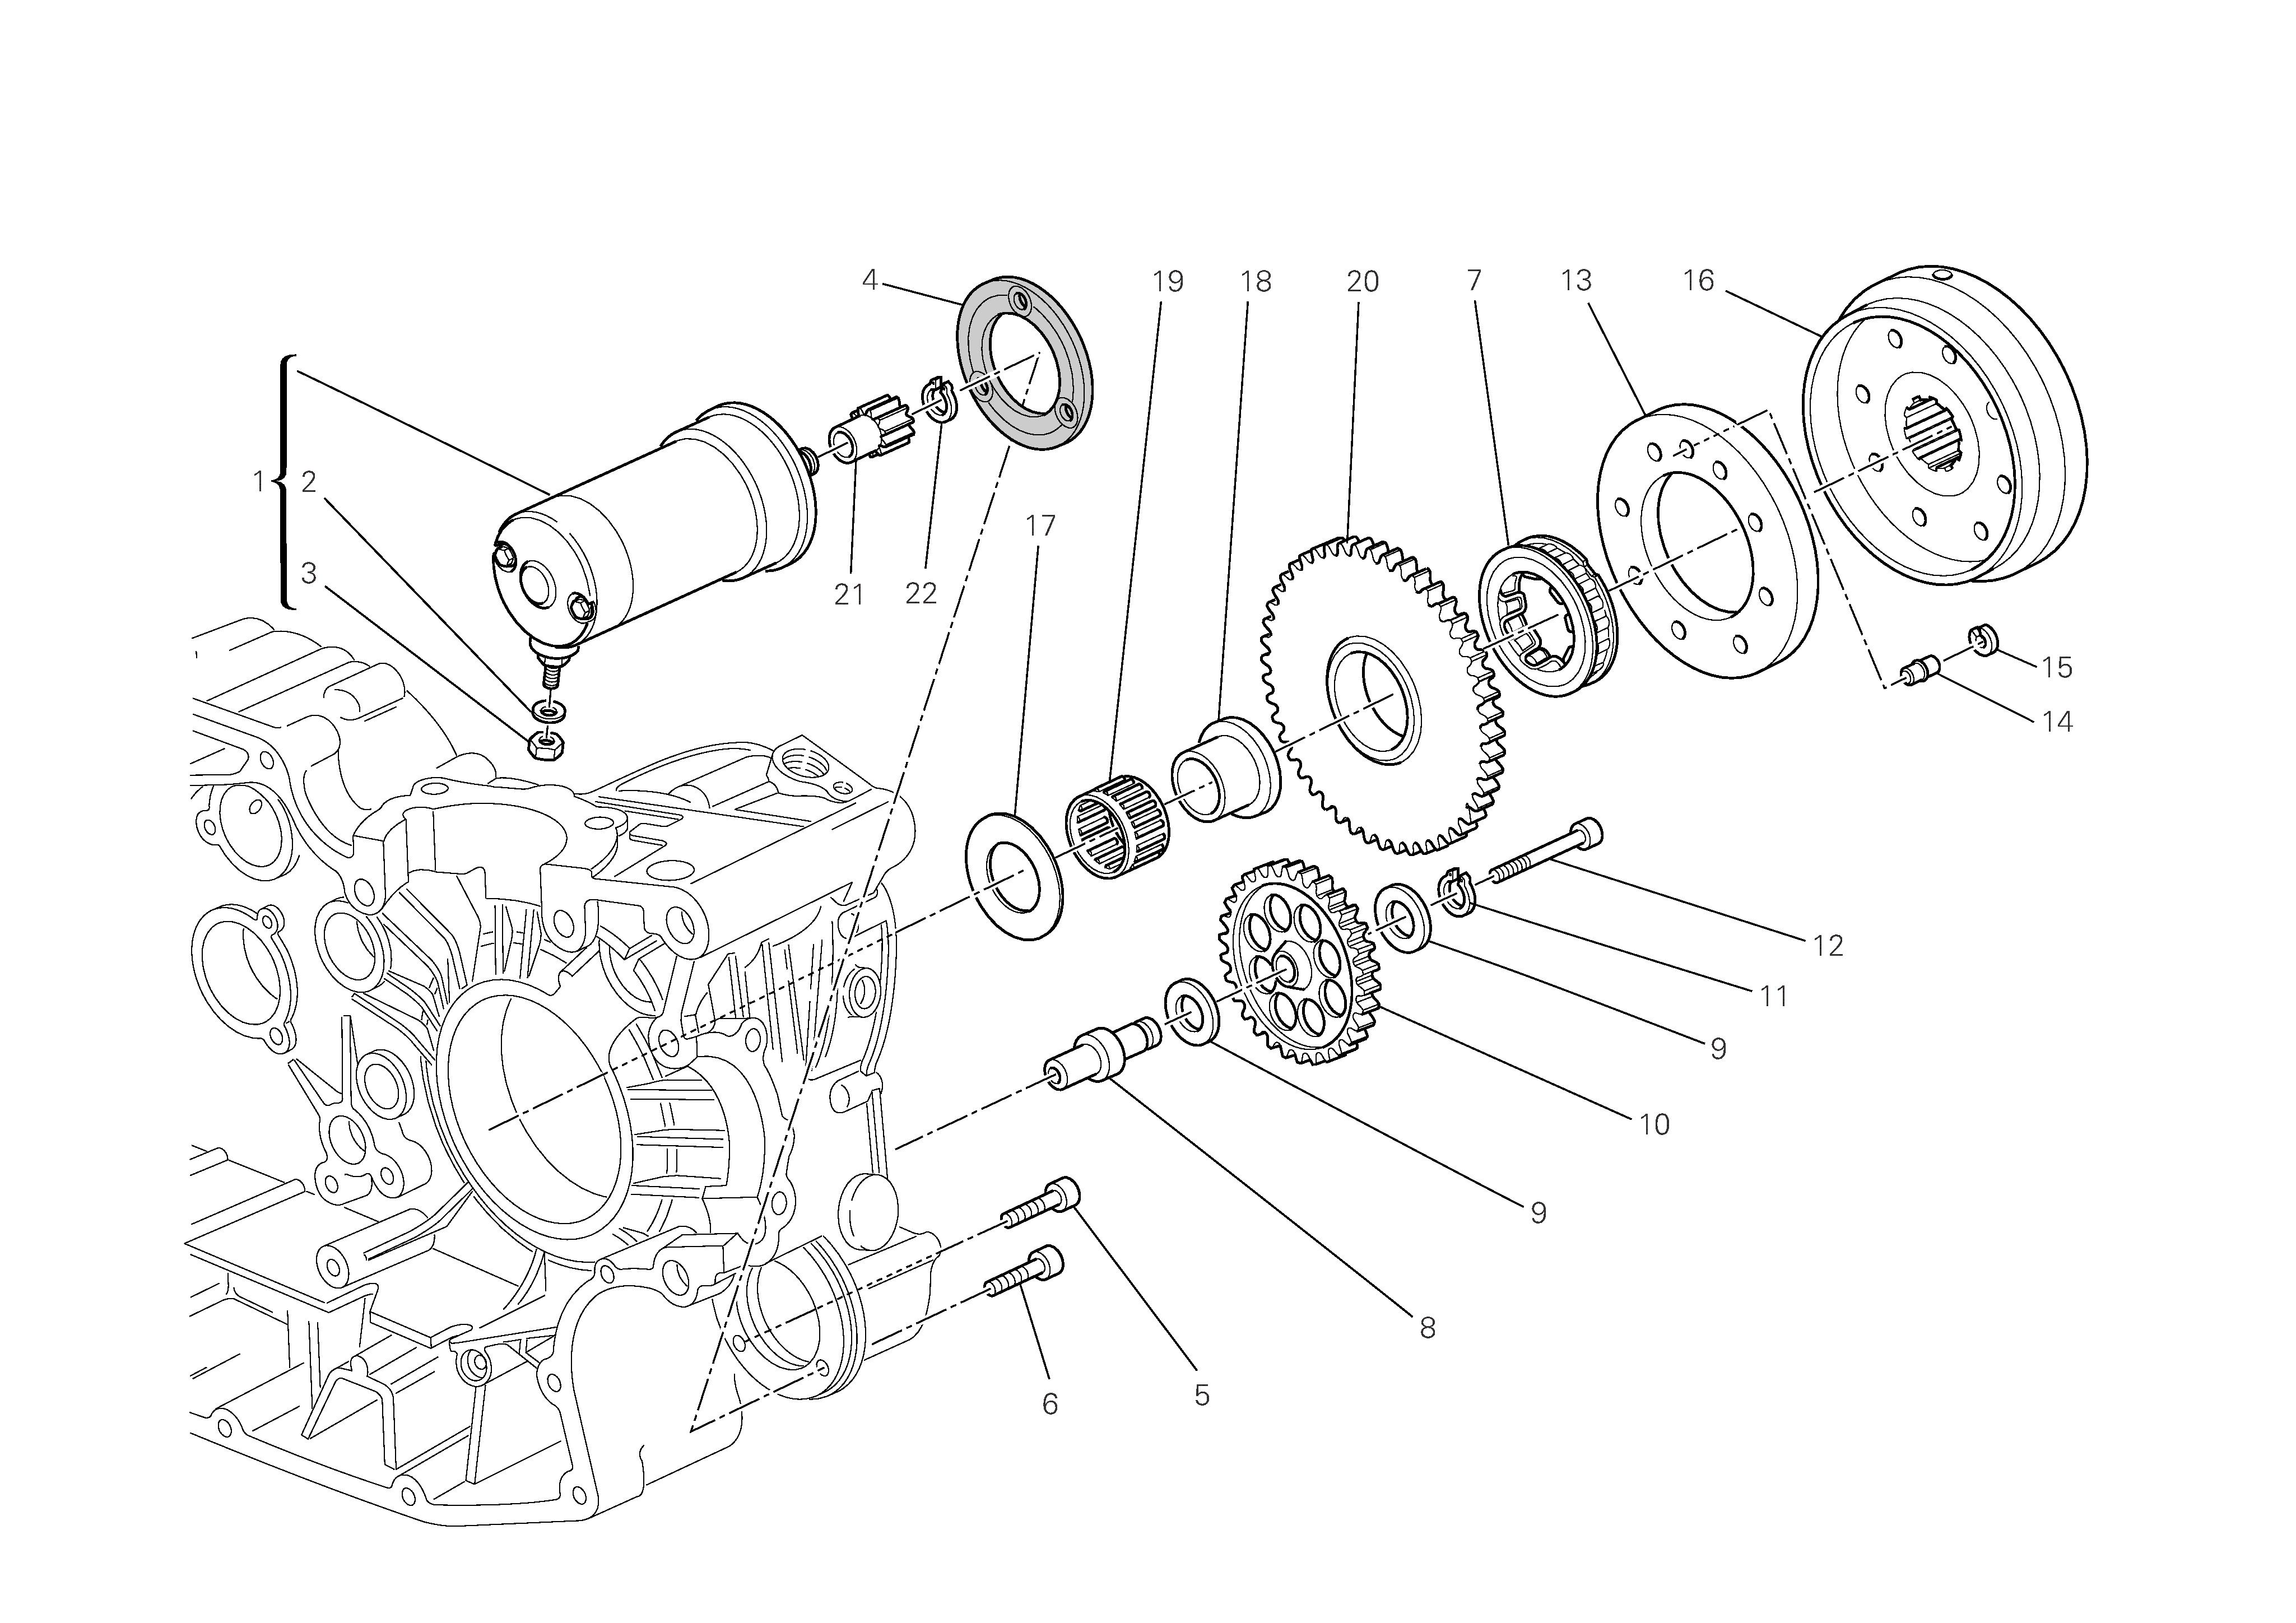 Schema electrique ducati monster 696